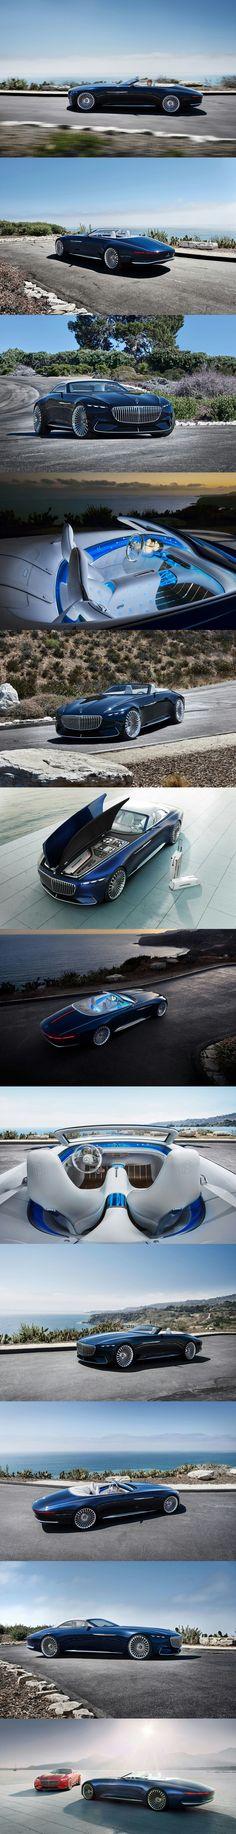 Vision Mercedes-Maybach 6 Cabriolet, Pebble Beach